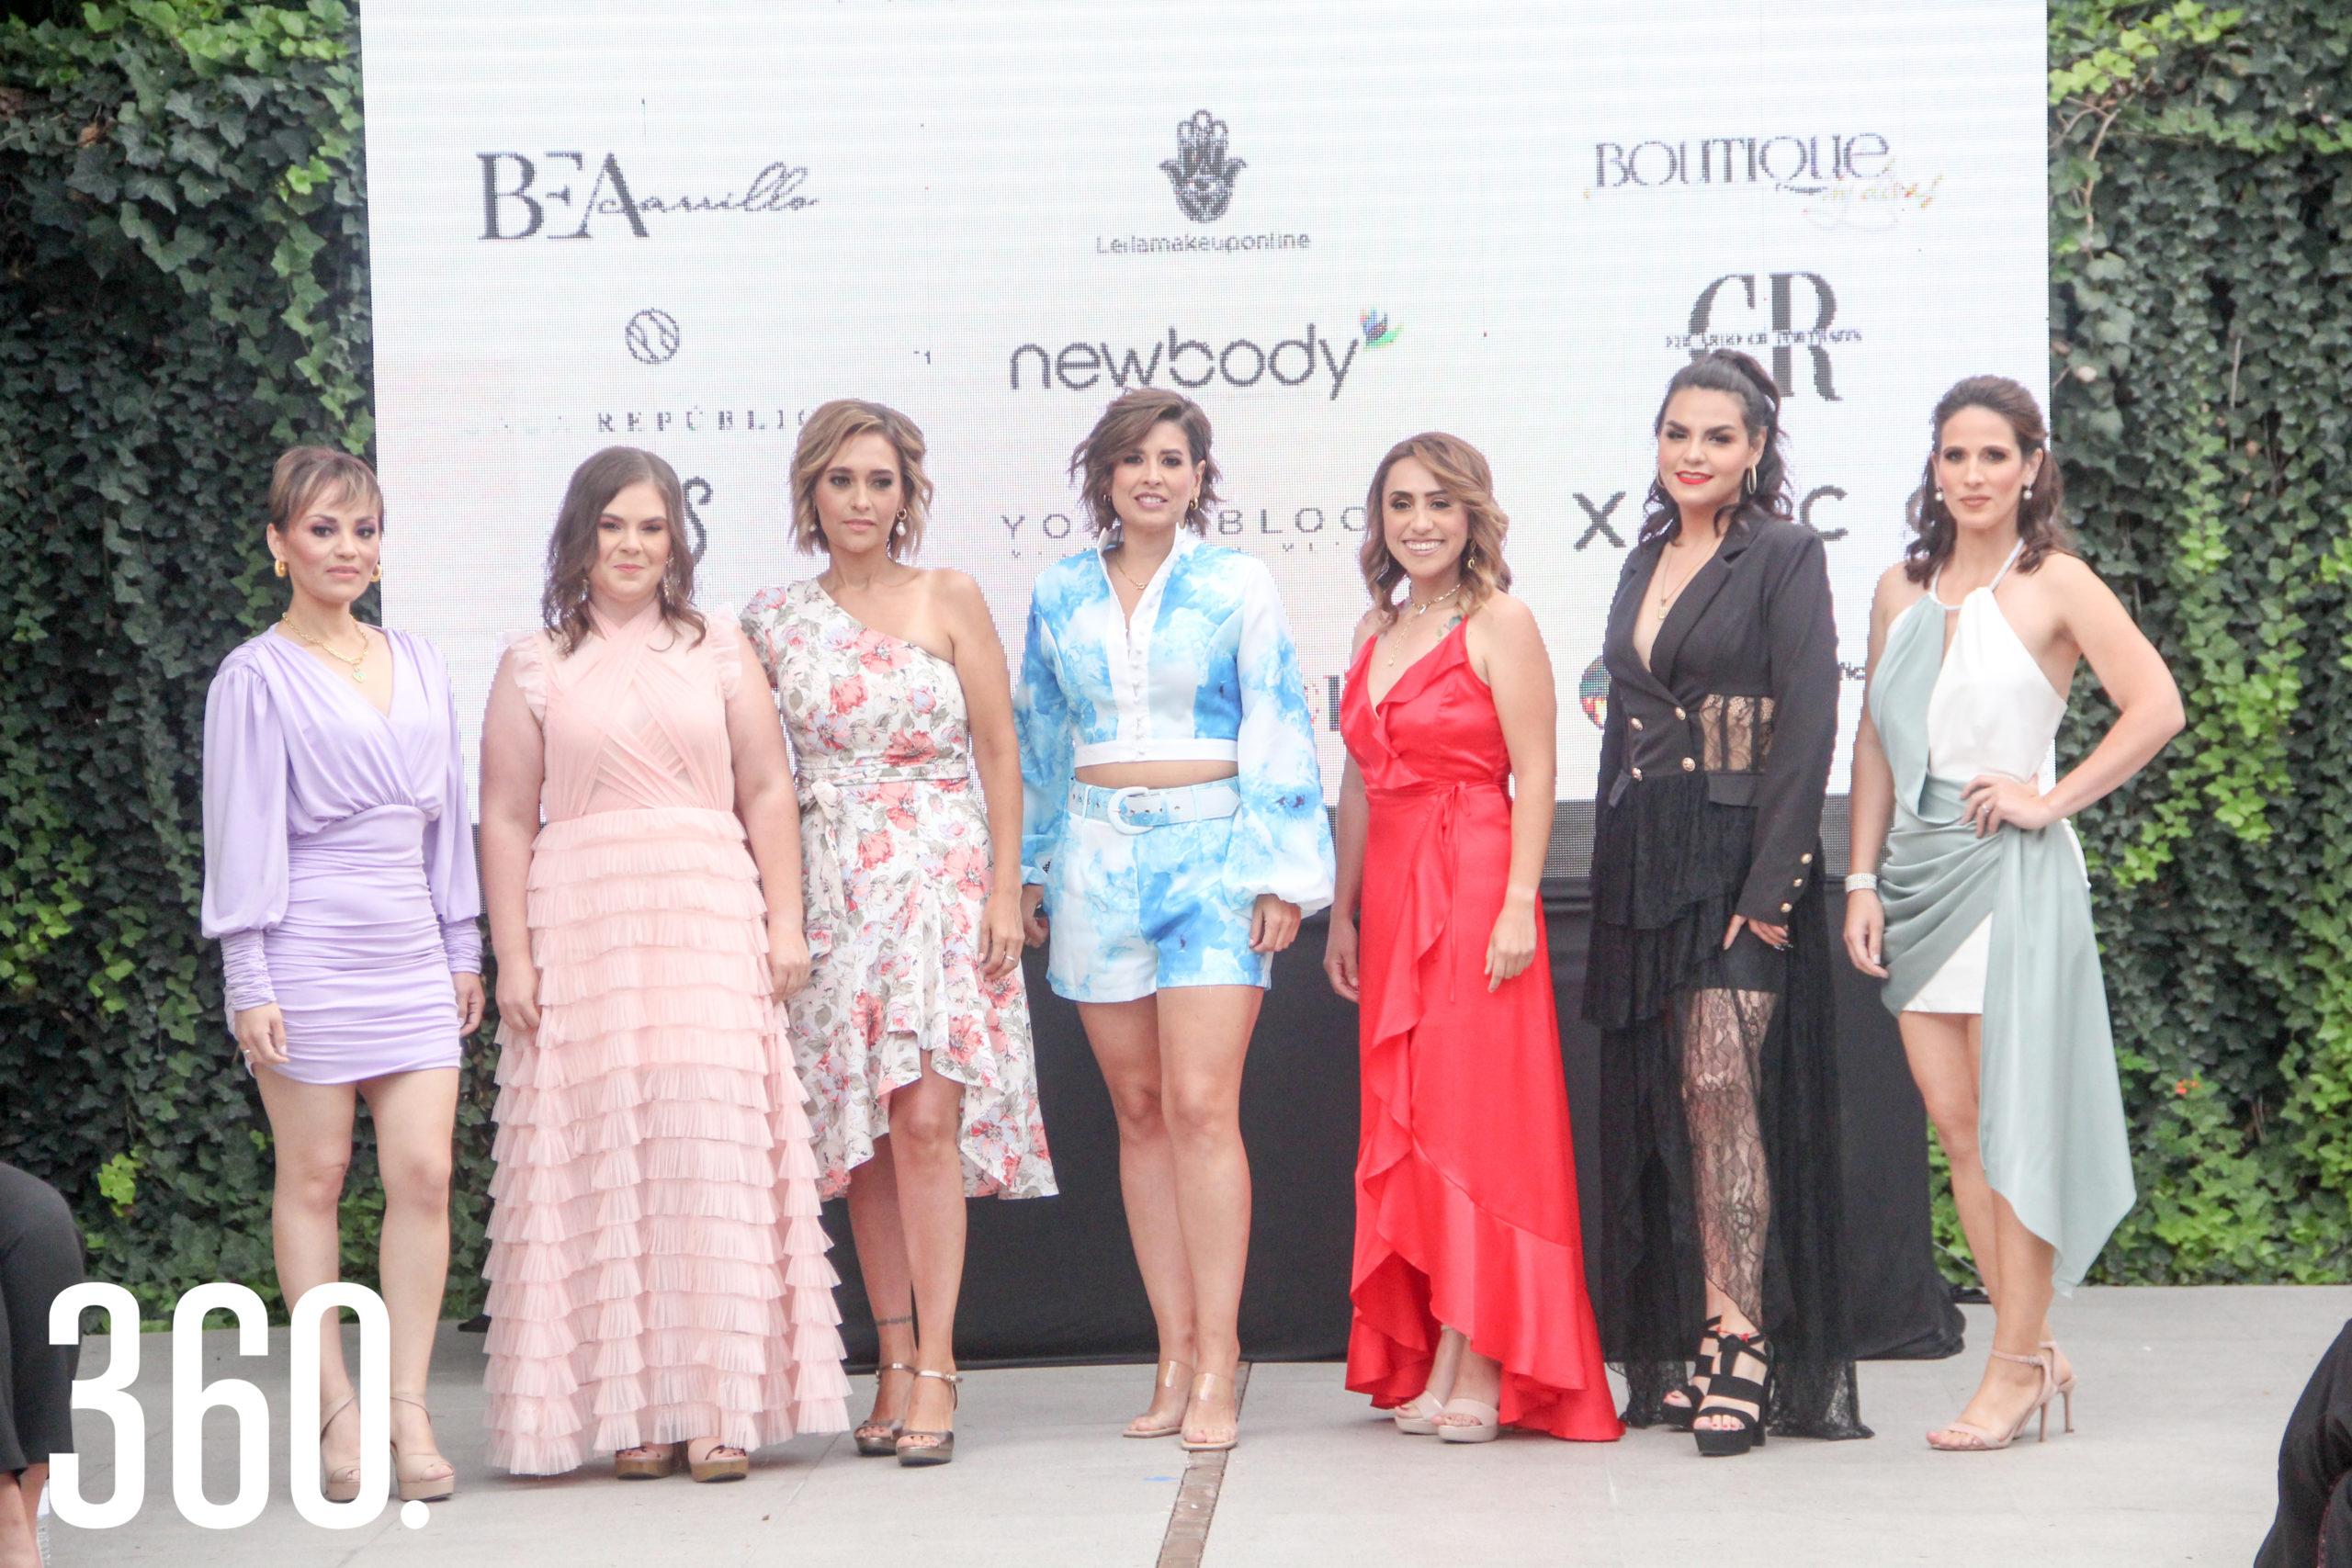 Leslie Almazán, Aurora Gámez, Melissa Zamora, Ari Villarreal, Paty Monroy, Dariela de Hoyos y Sarai Torres.